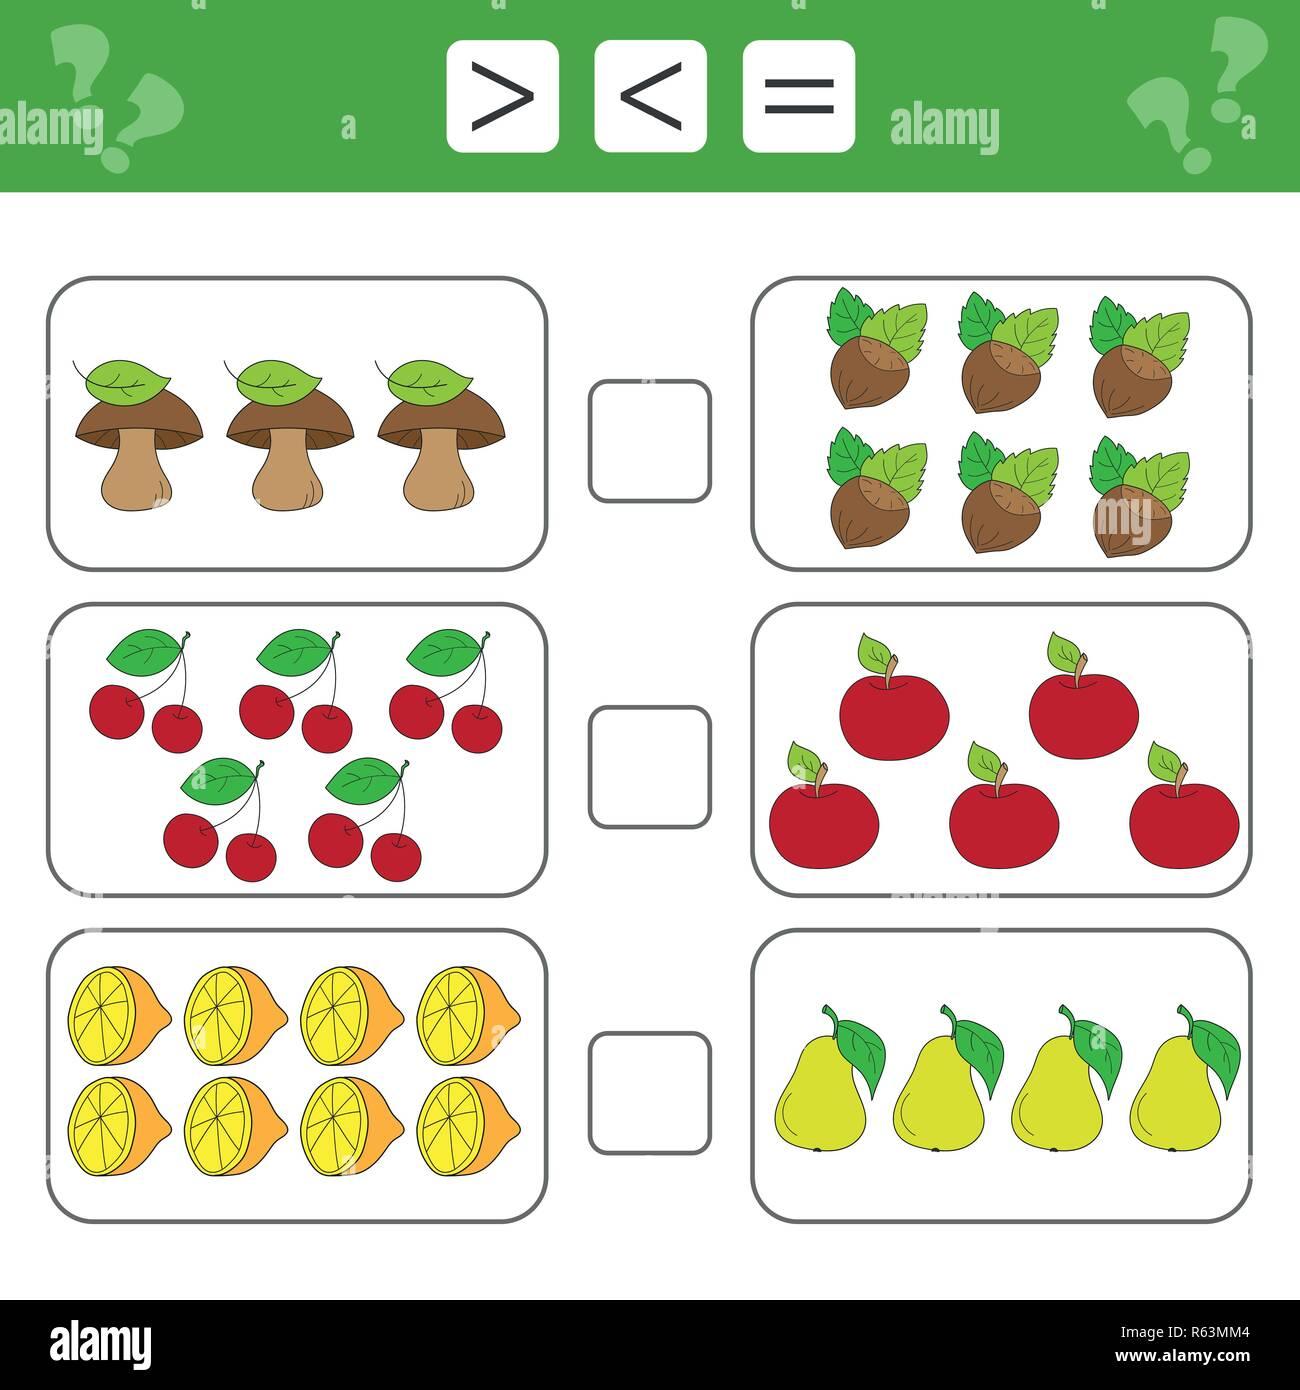 Mathematik Arbeitsblatt Fur Kinder Kinder Zahlen